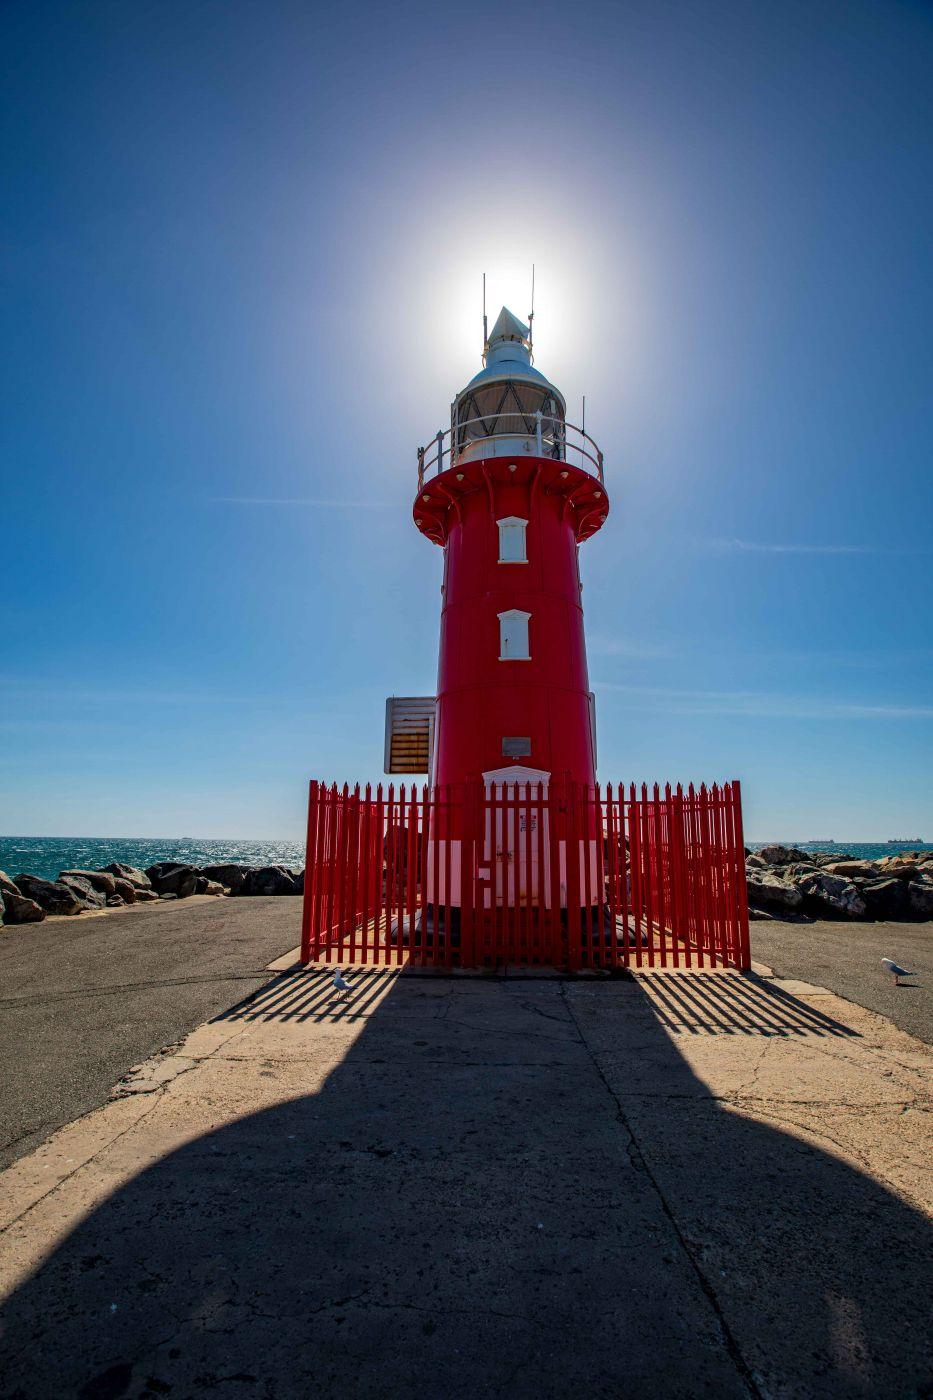 North Mole Lighthouse, Freemantle, Western Australia, Australia